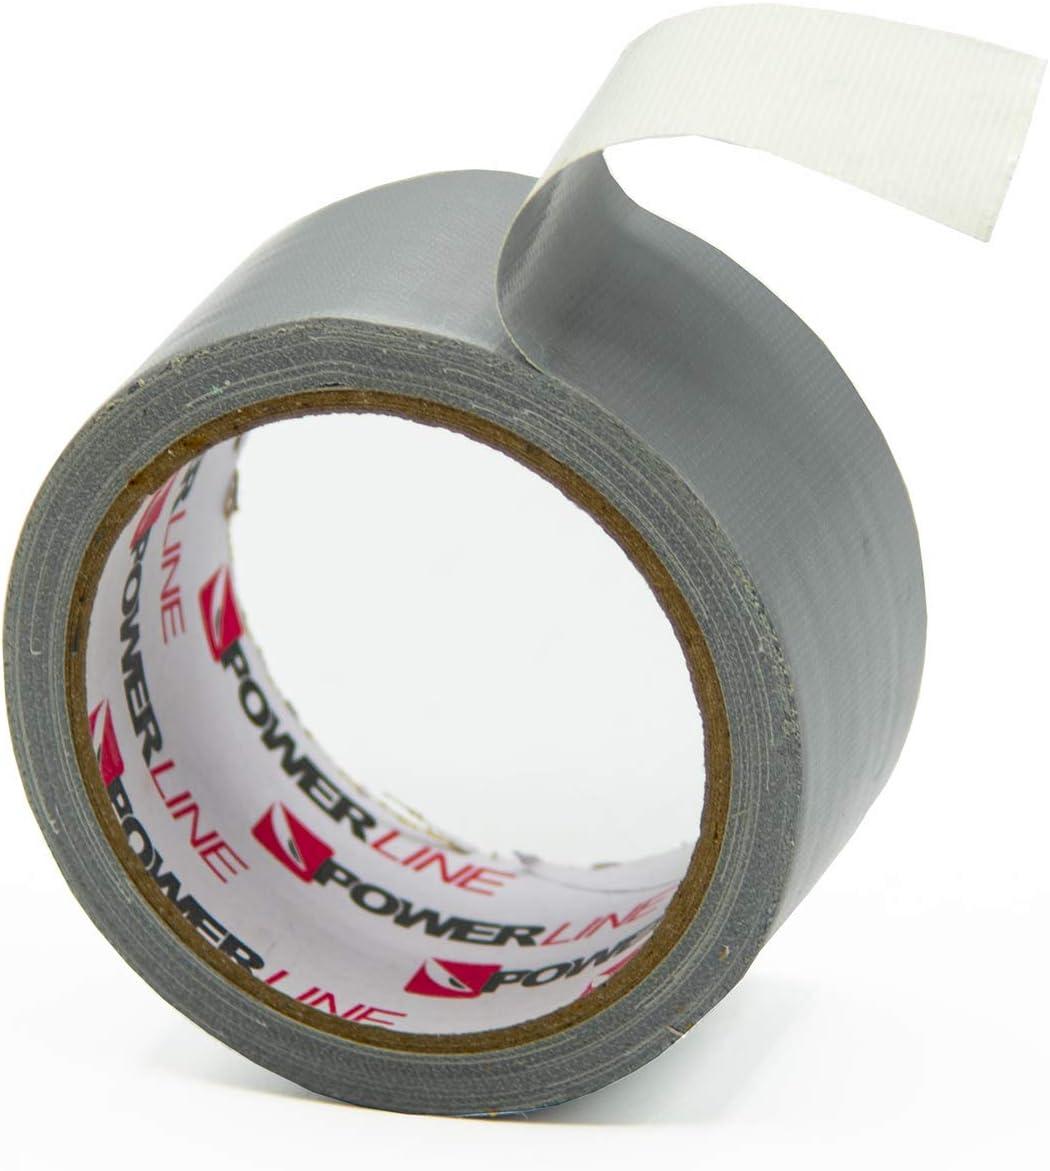 Reparaturband Cloth Tape 1 Rolle Power-Line Gewebeband 10m x 48mm Panzerband Gewebeklebeband Ducttape Steinband